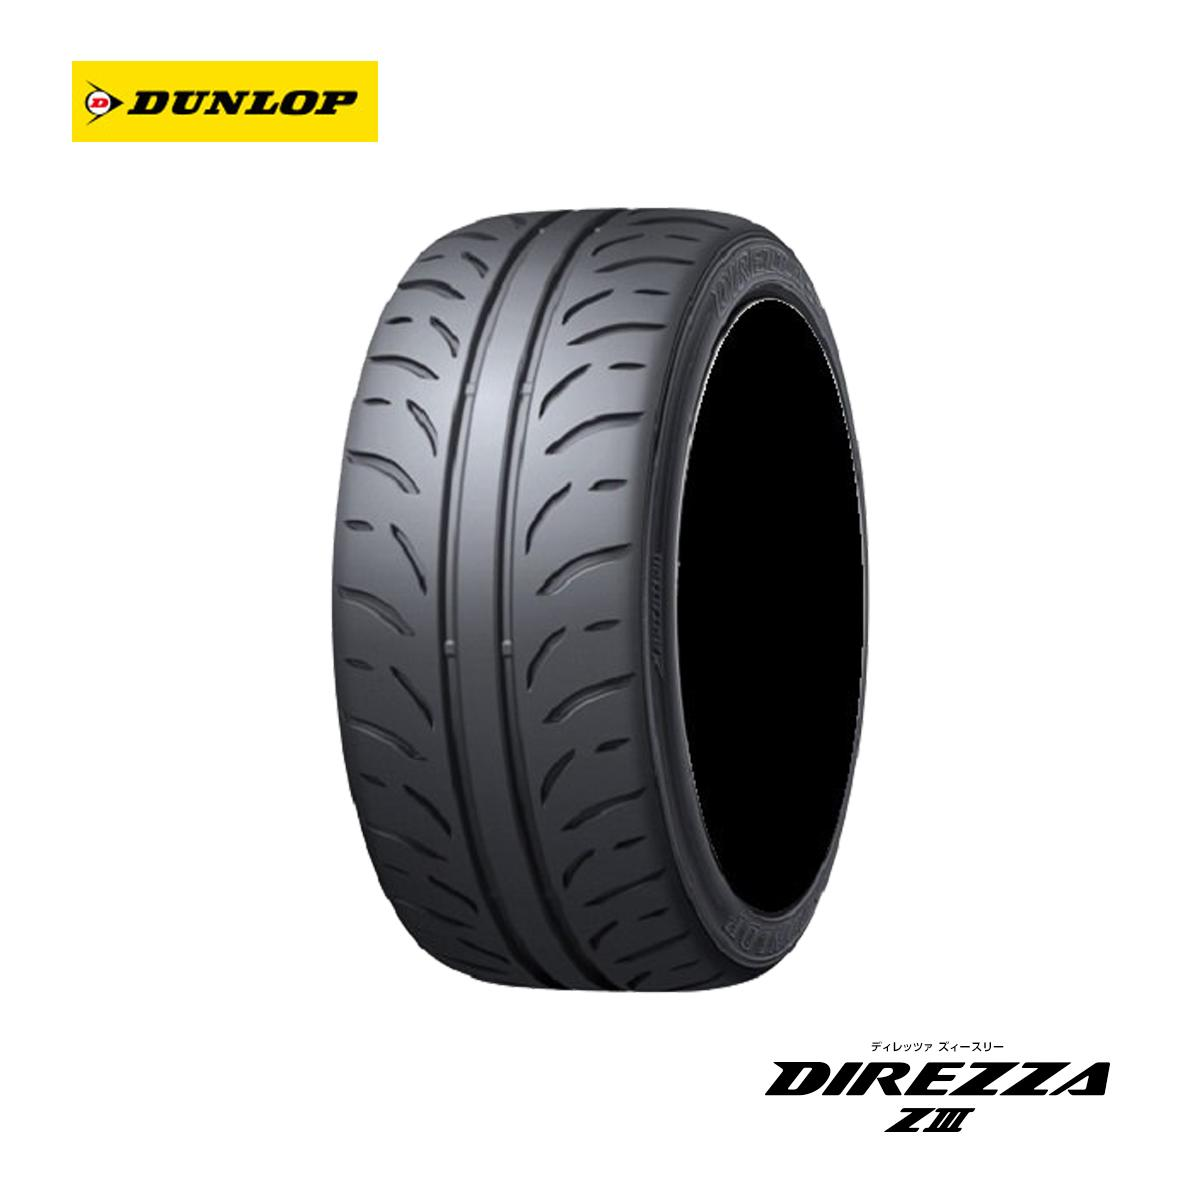 DUNLOPダンロップ国産サマータイヤ2本16インチ225/50R16DIREZZAZ3ディレッツァ